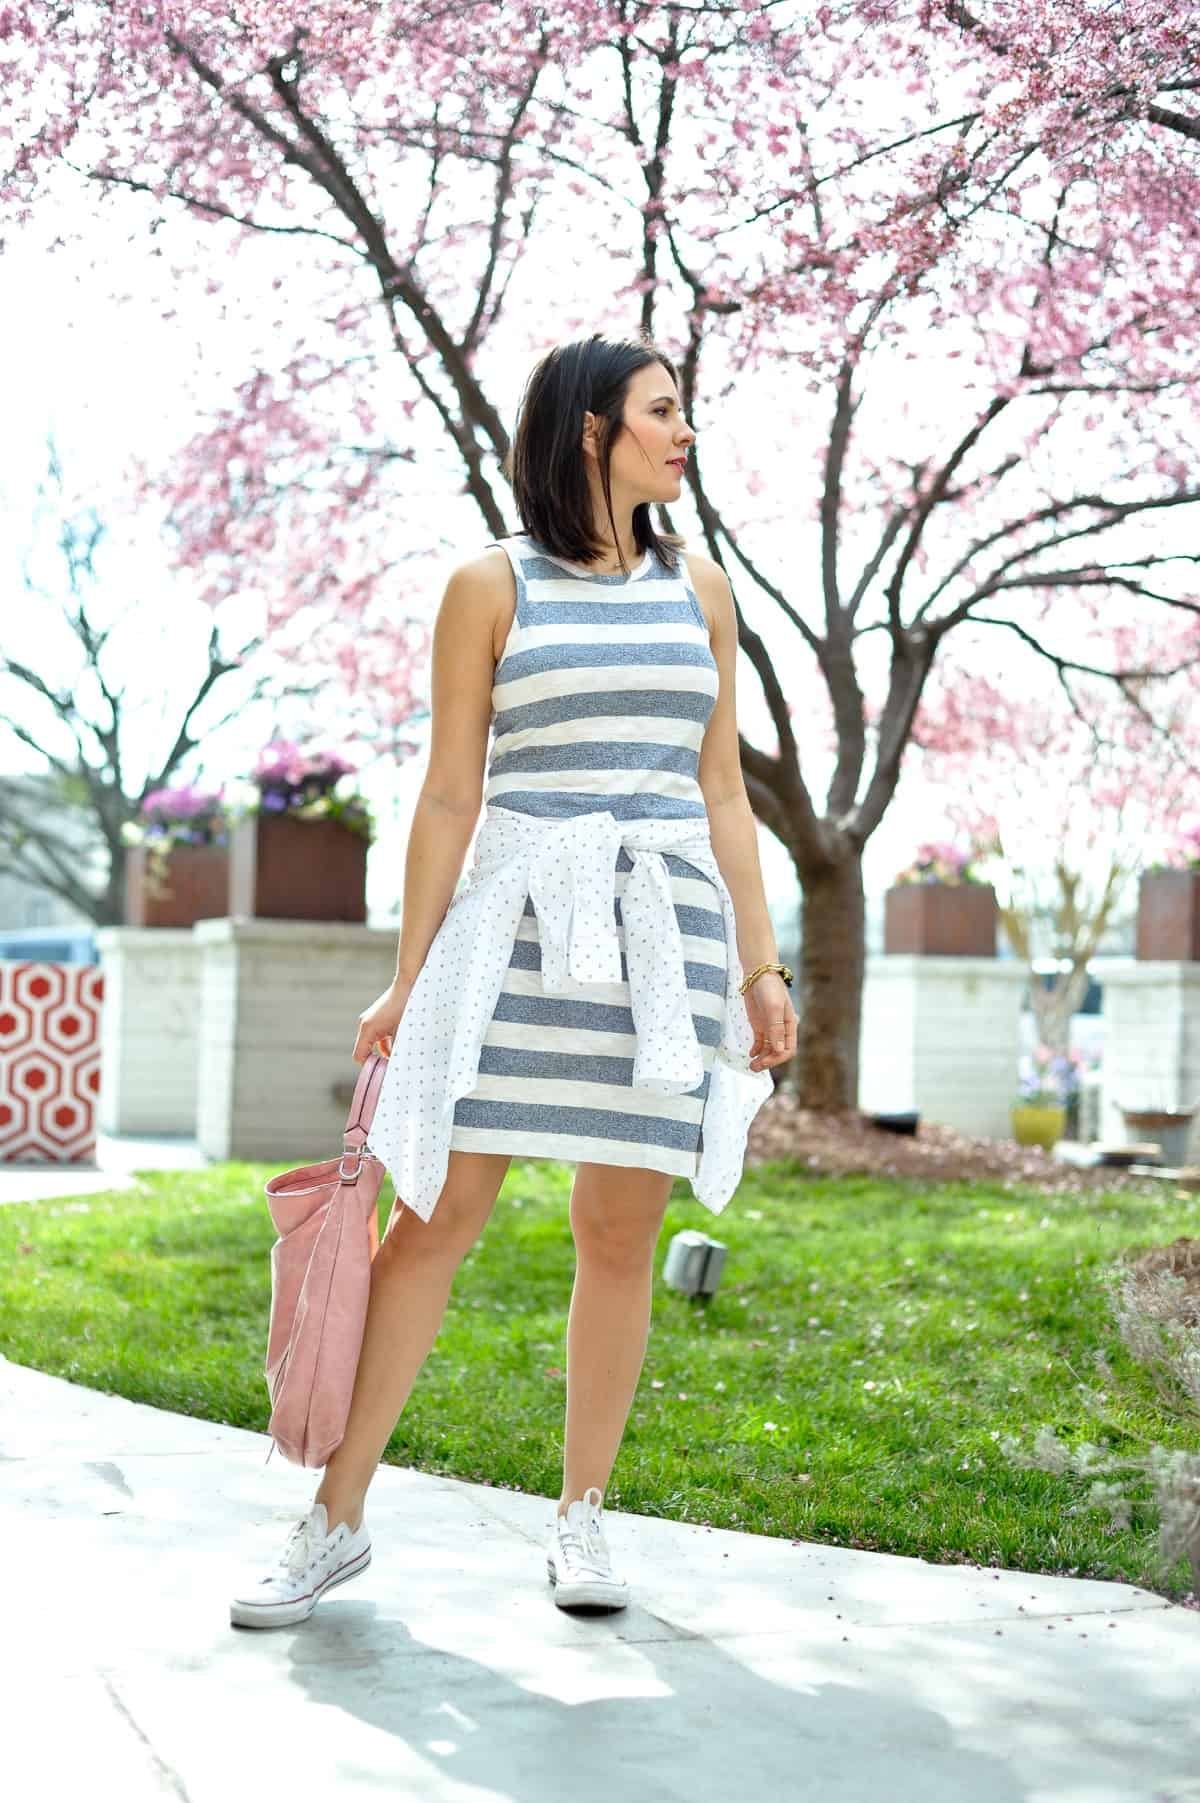 Jessica Camerata wears a striped cotton tank dress